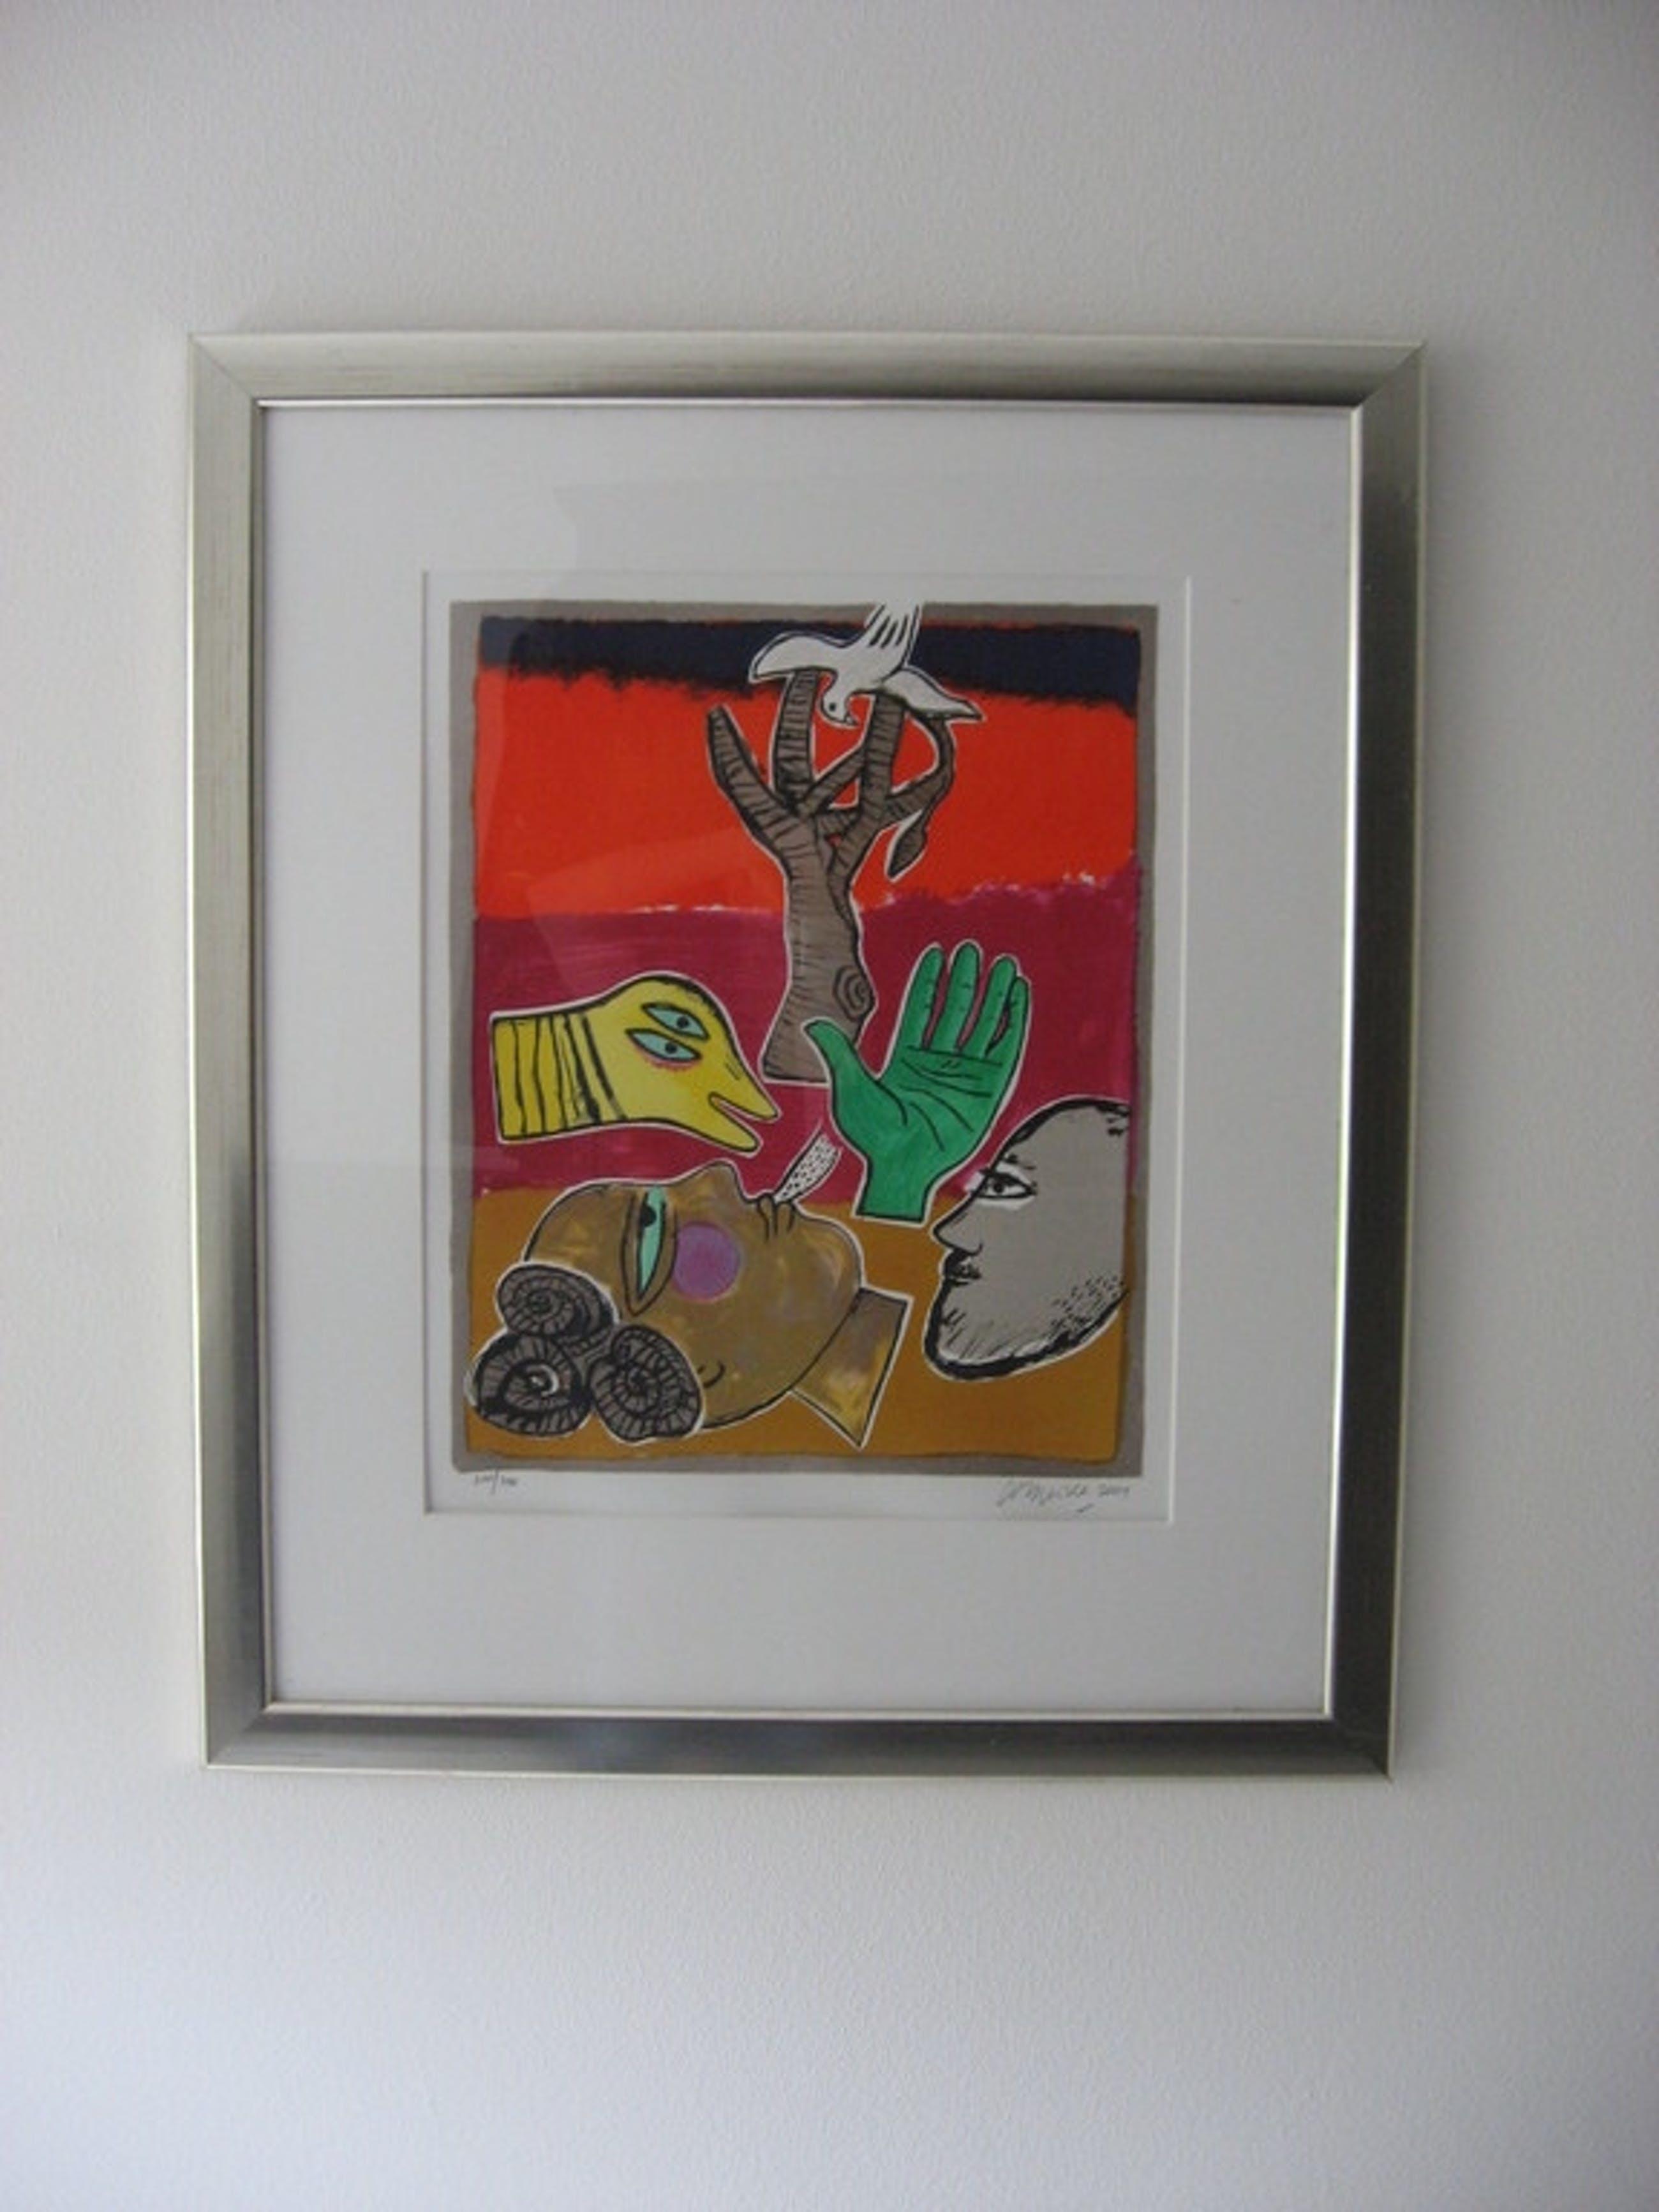 Corneille: Kleurenlitho, Un bel été, 2001, ingelijst kopen? Bied vanaf 219!